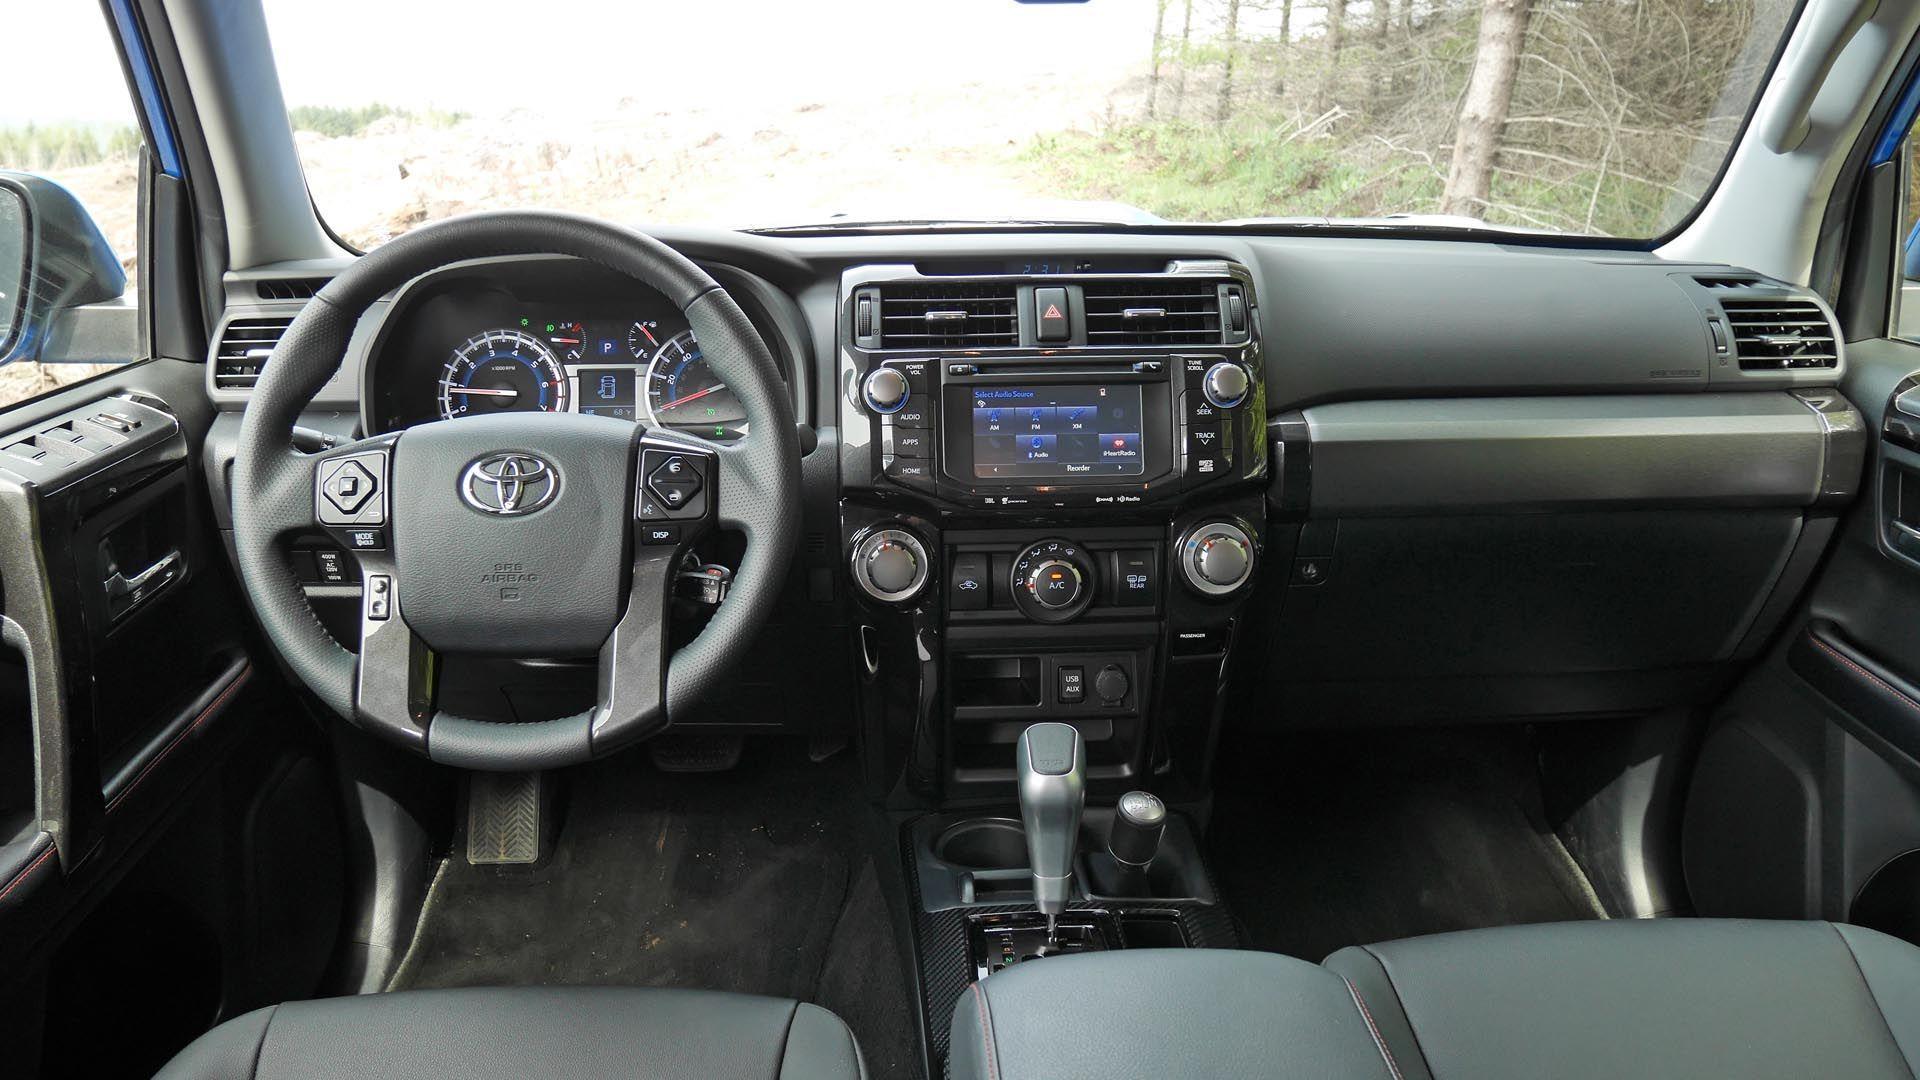 2019 Toyota 4runner Trd Pro Manual Transmission Toyota 4runner Trd Toyota 4runner Toyota Forerunner